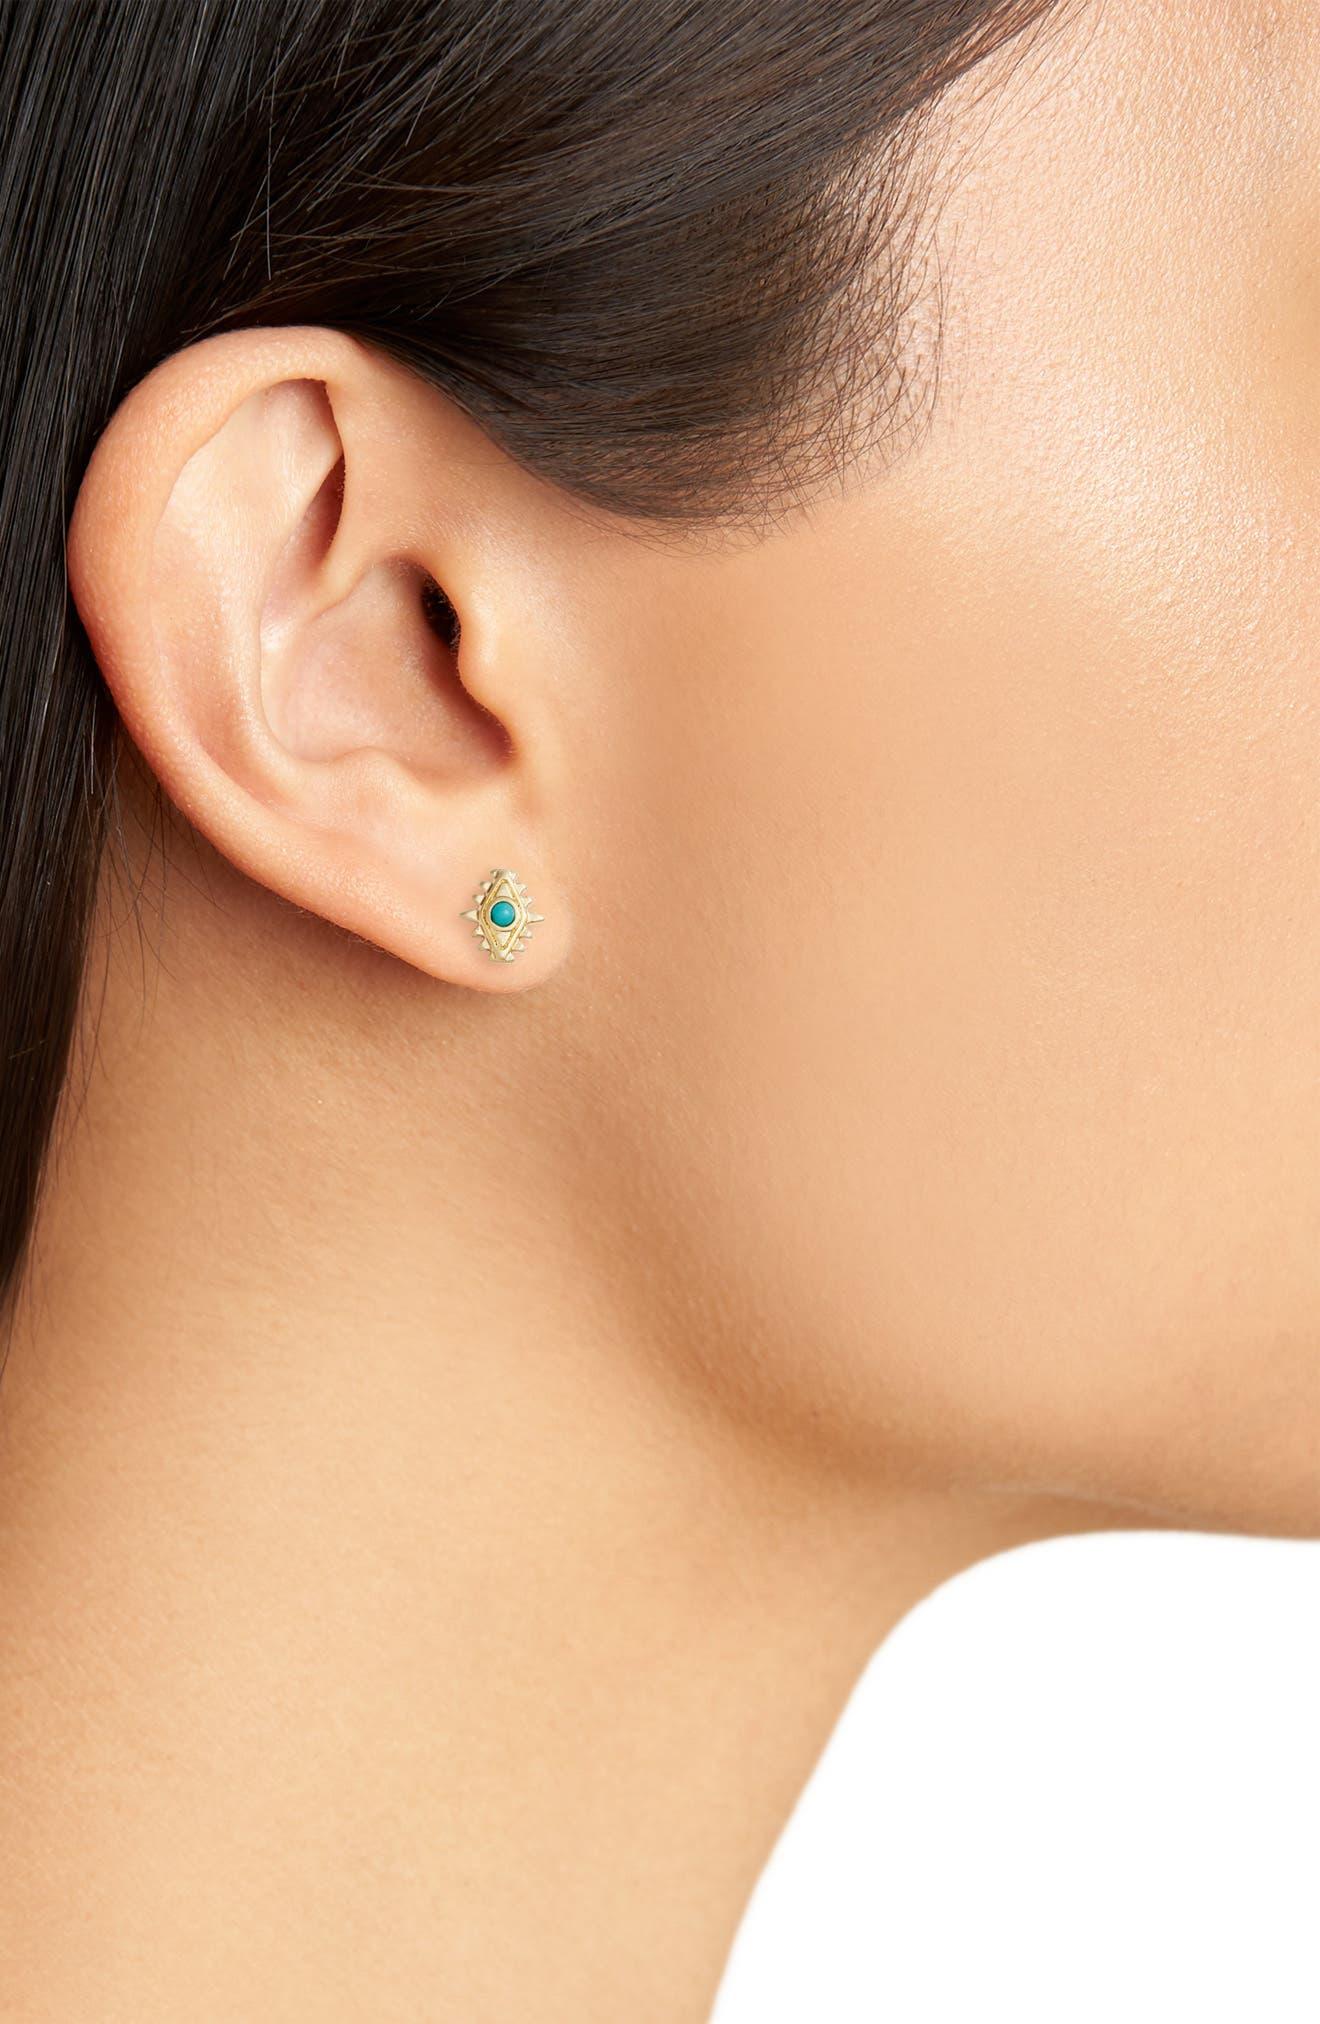 Set of 2 Stud Earrings,                             Alternate thumbnail 2, color,